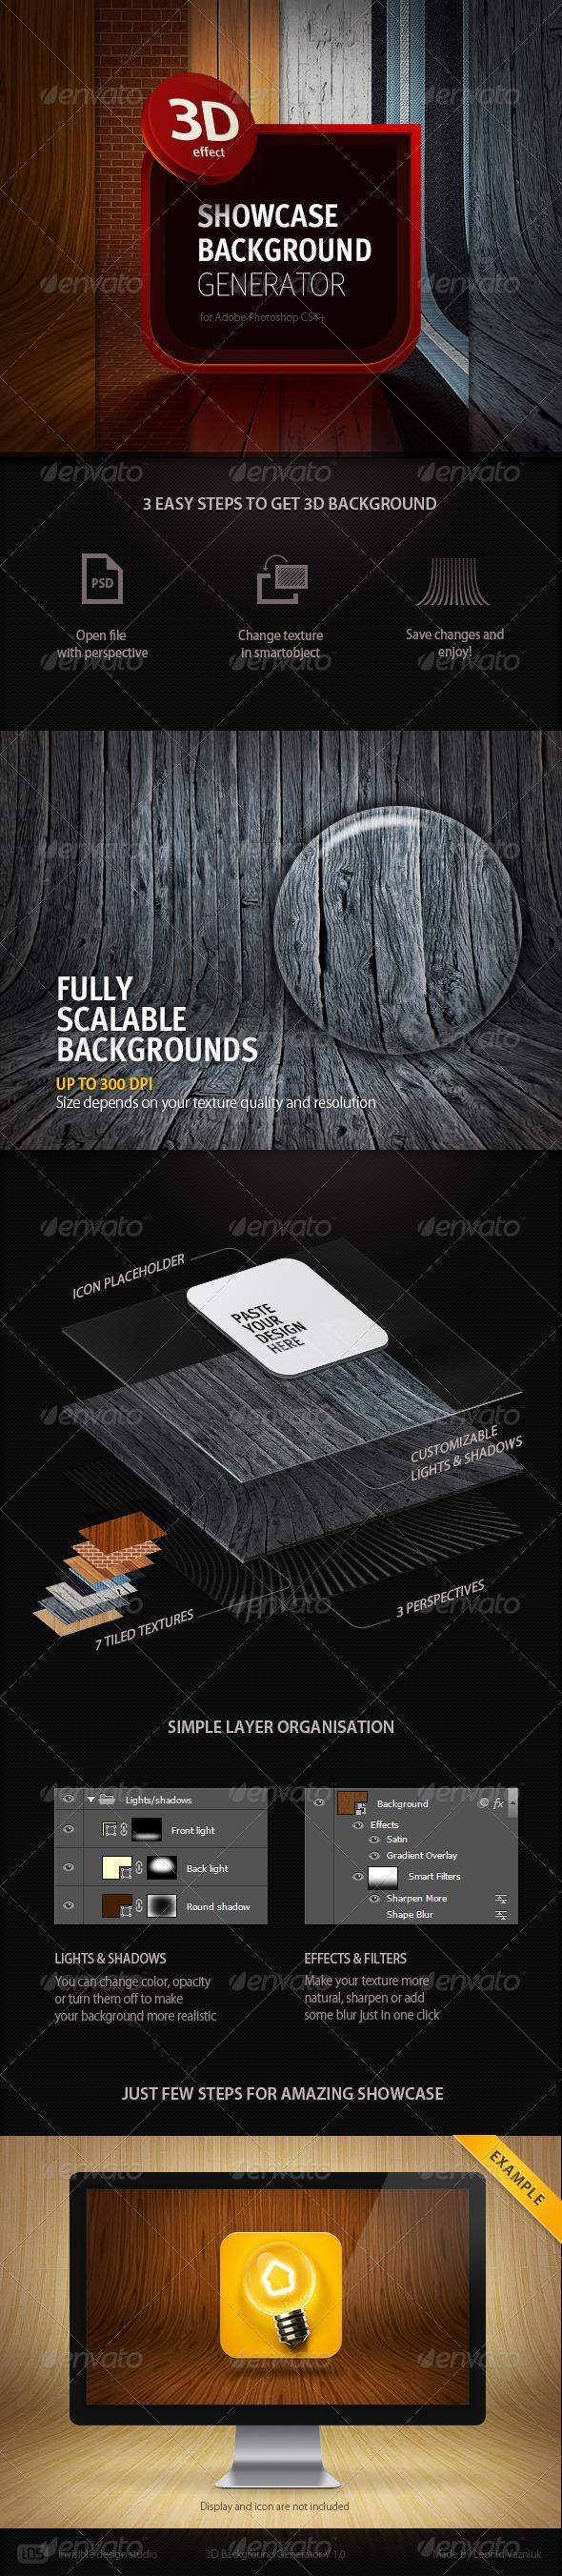 GraphicRiver 3D Showcase Background Generator 4122381